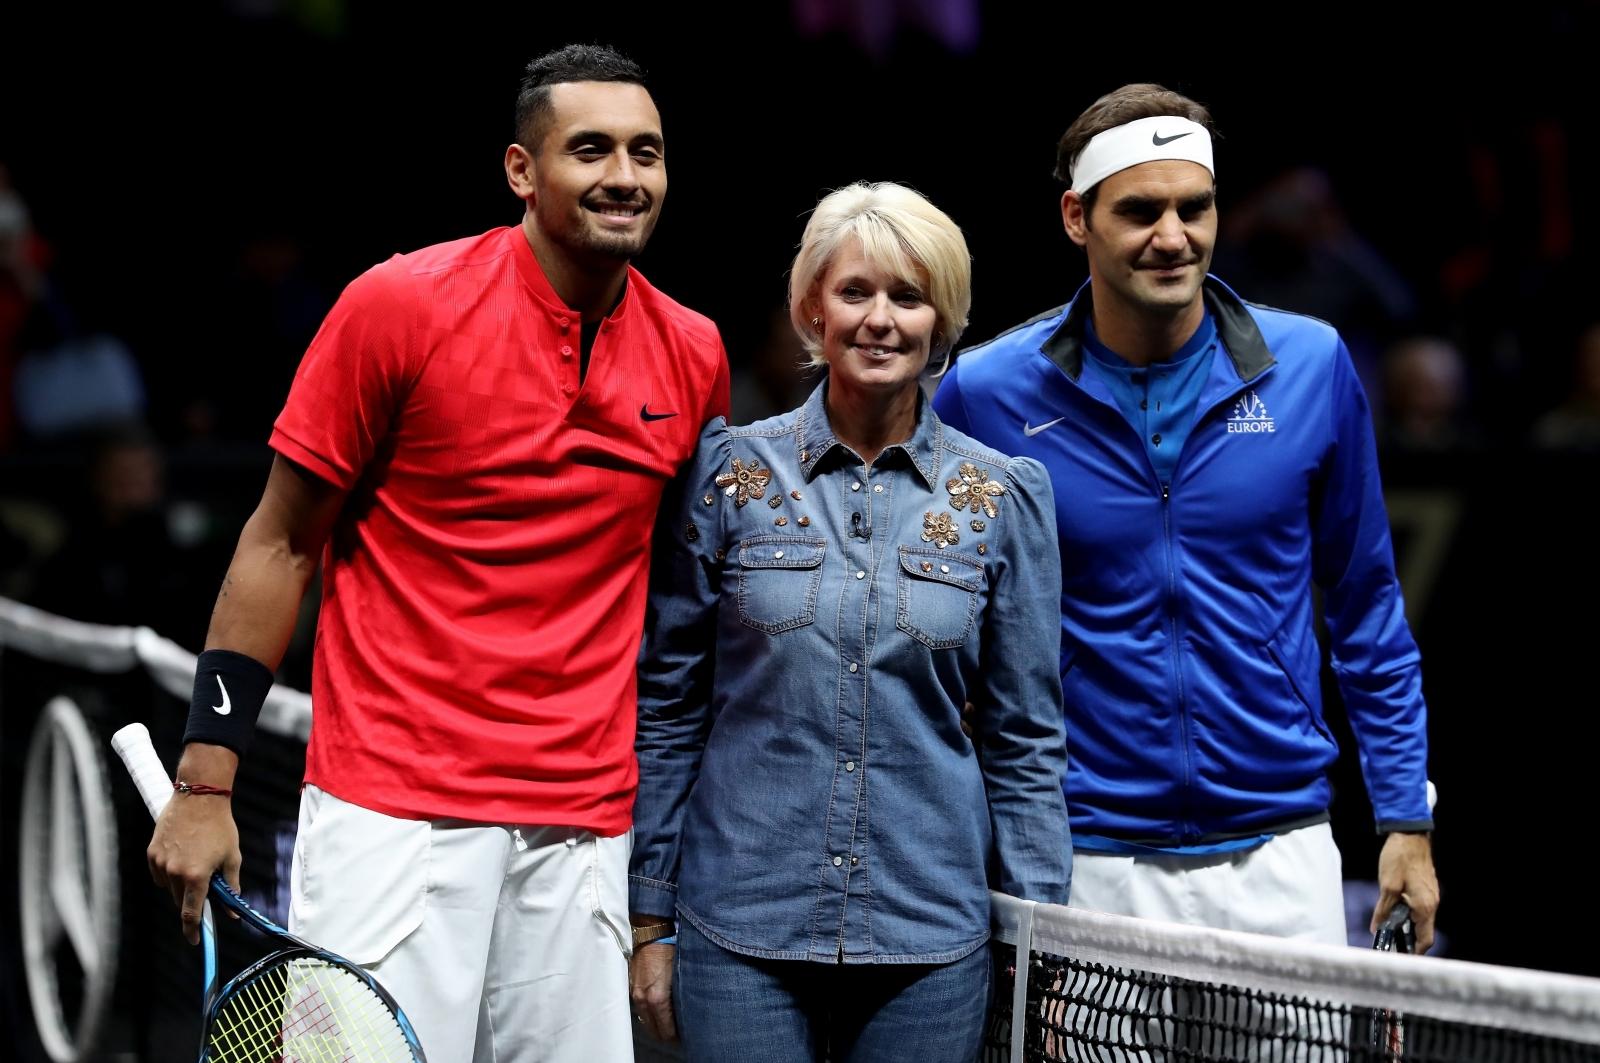 Nick Kyrgios-Roger Federer